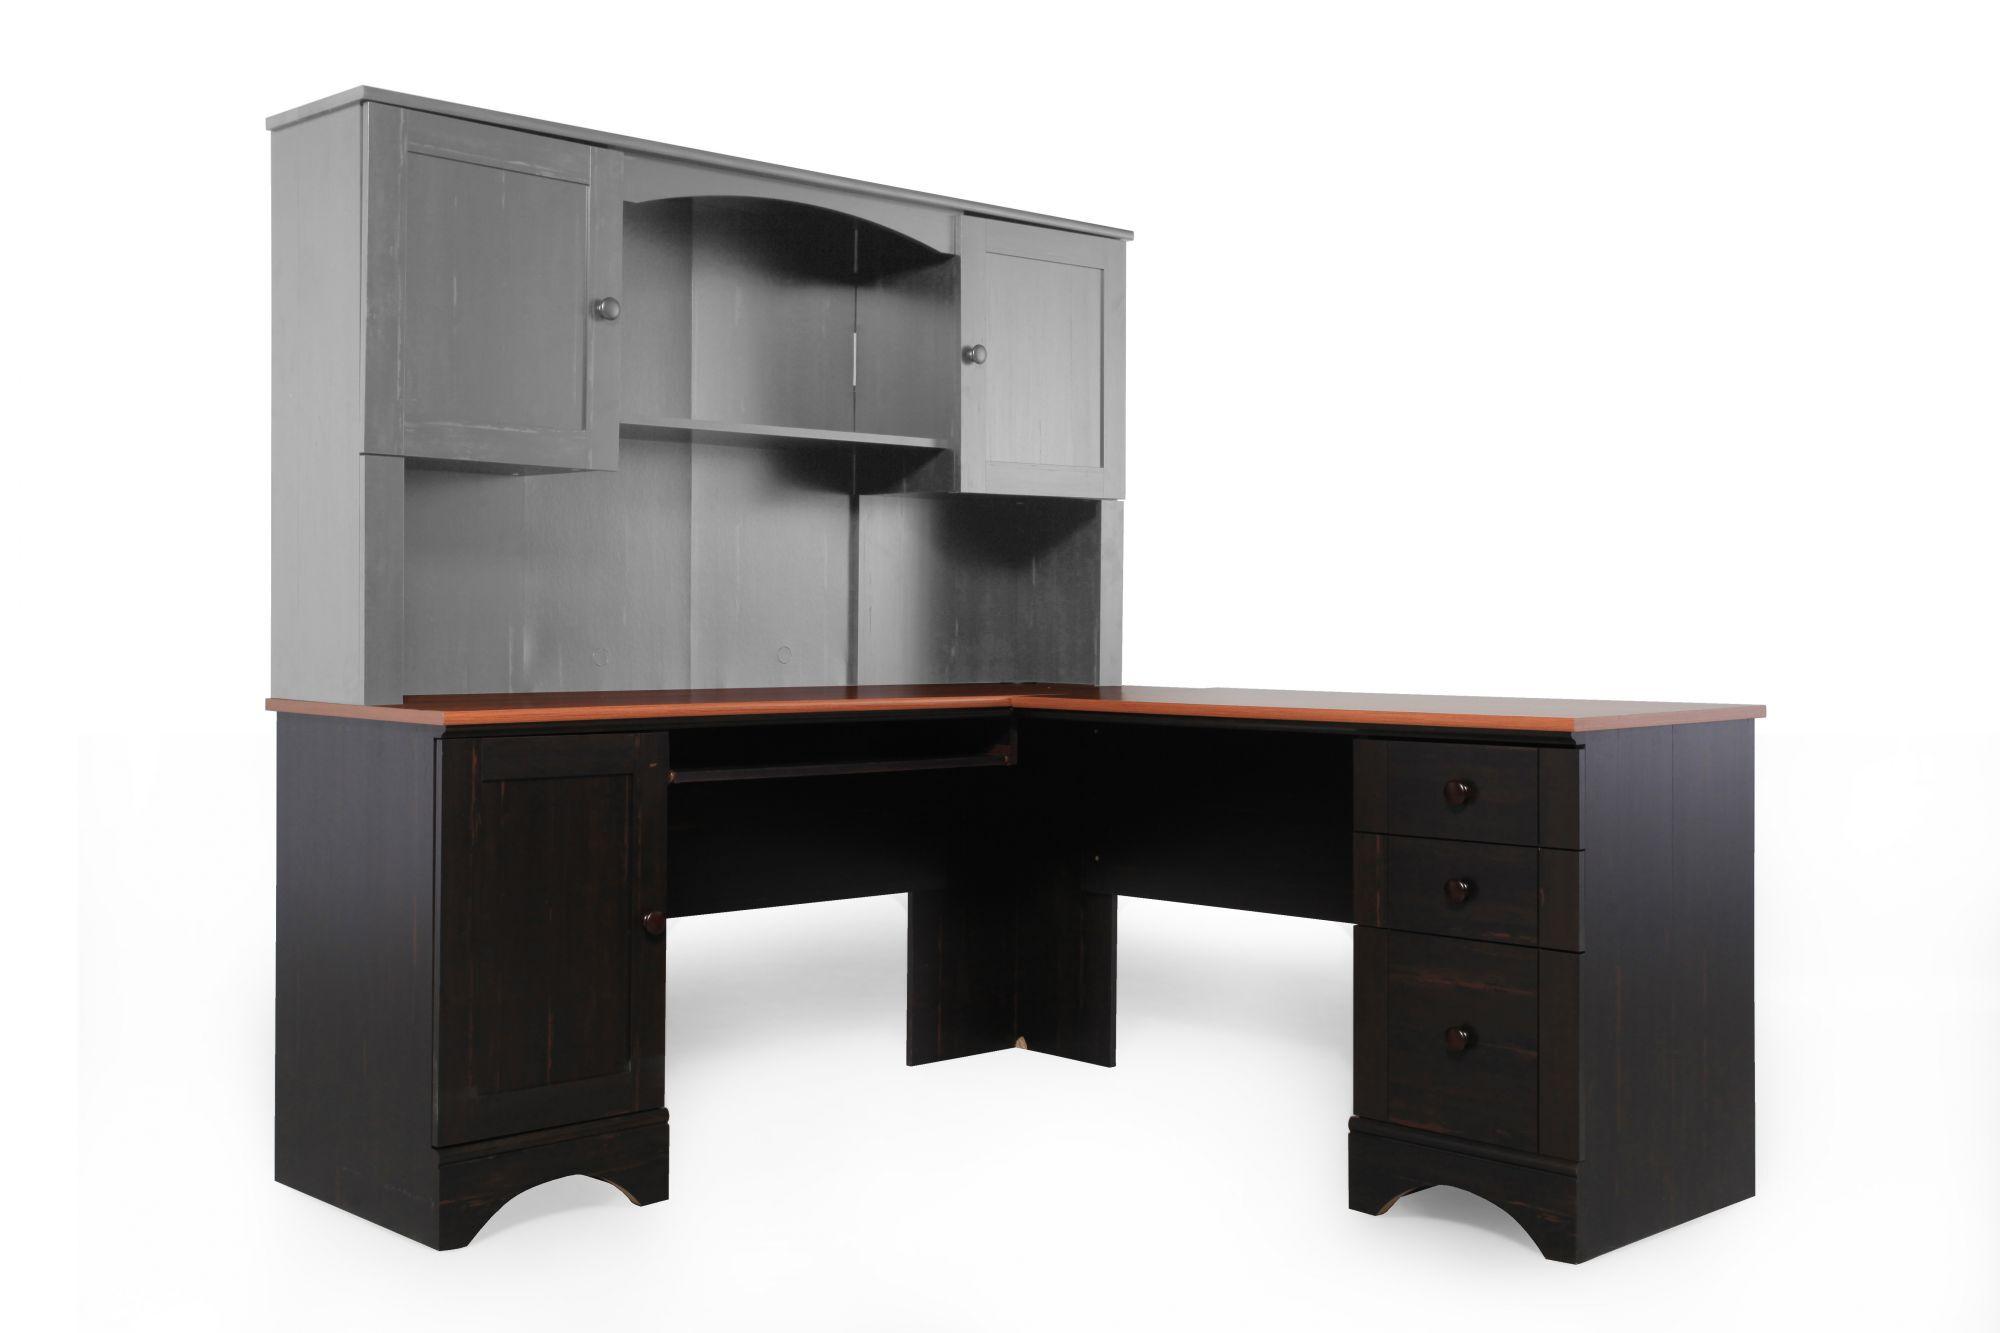 Espresso Corner Desk from Sauder Mathis Brothers